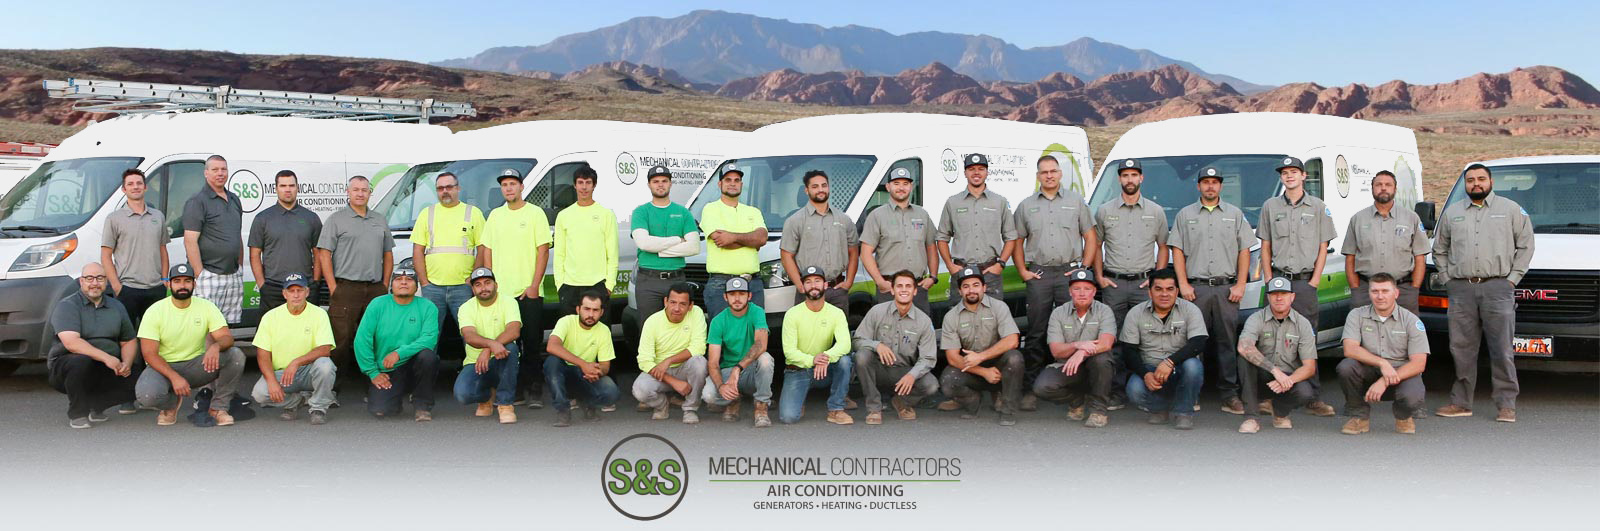 S&S Mechanical Team